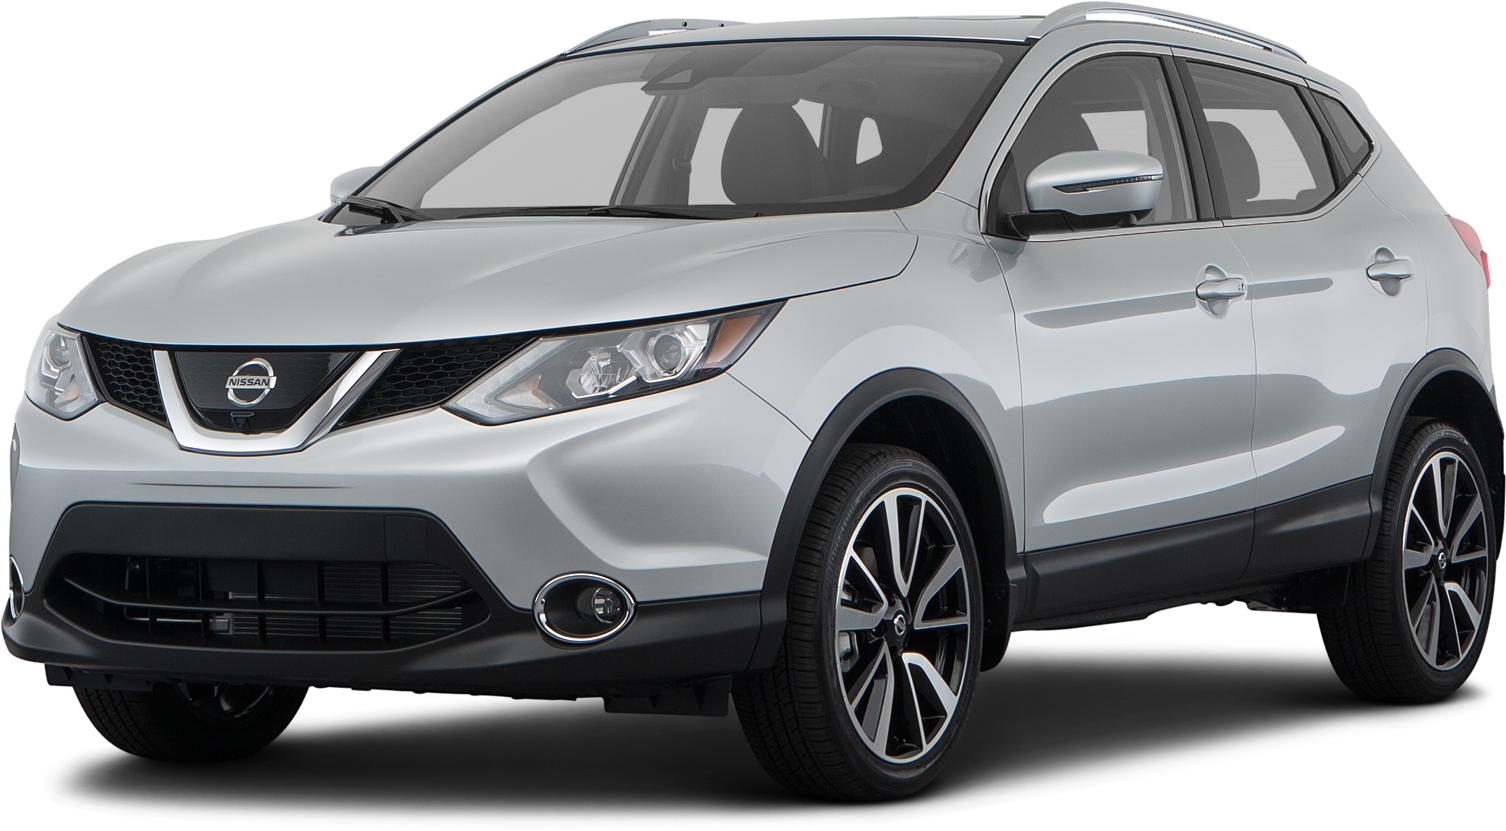 2018 Nissan Rogue Sport SUV SL